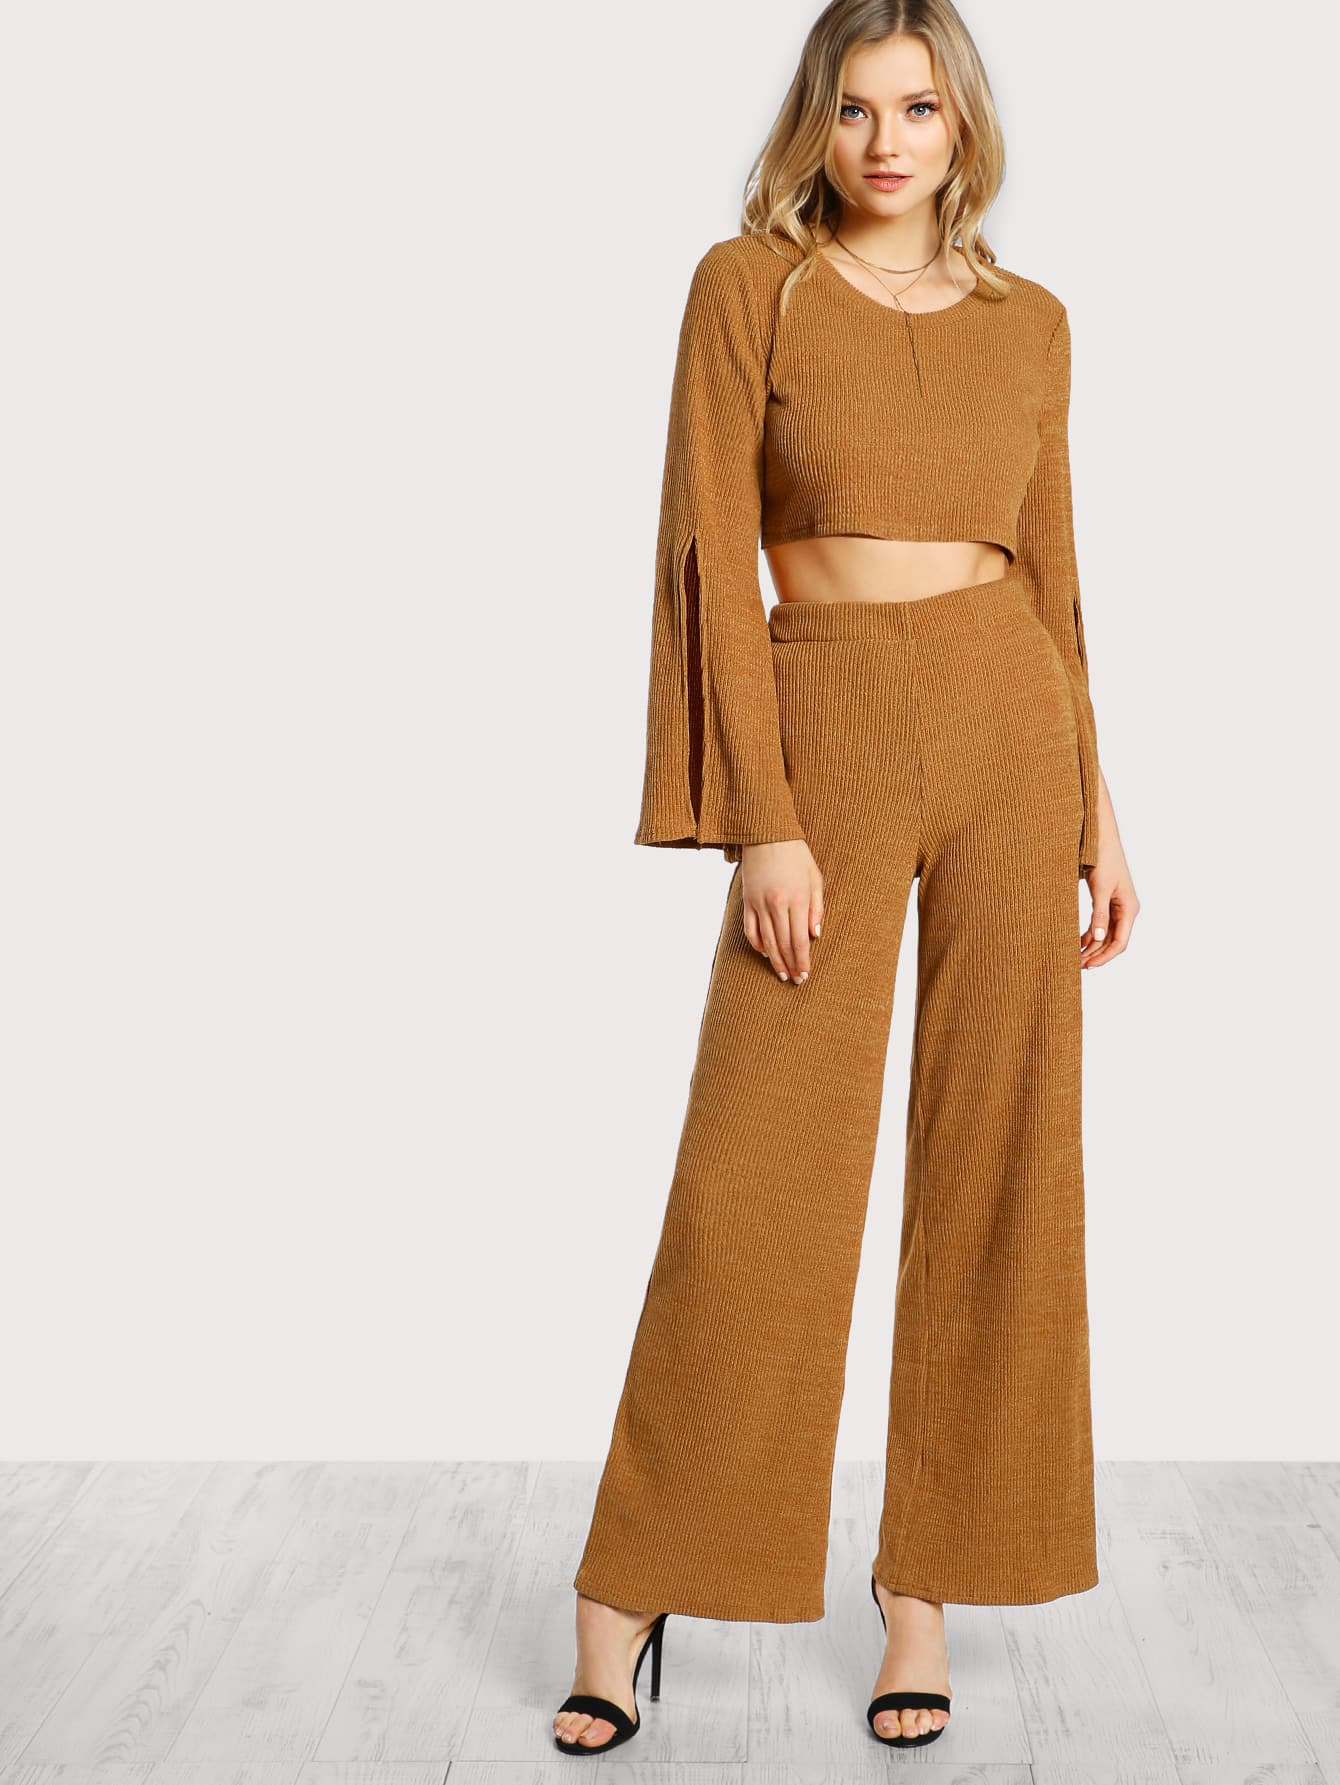 Split Sleeve Crop Top & Palazzo Pants Set